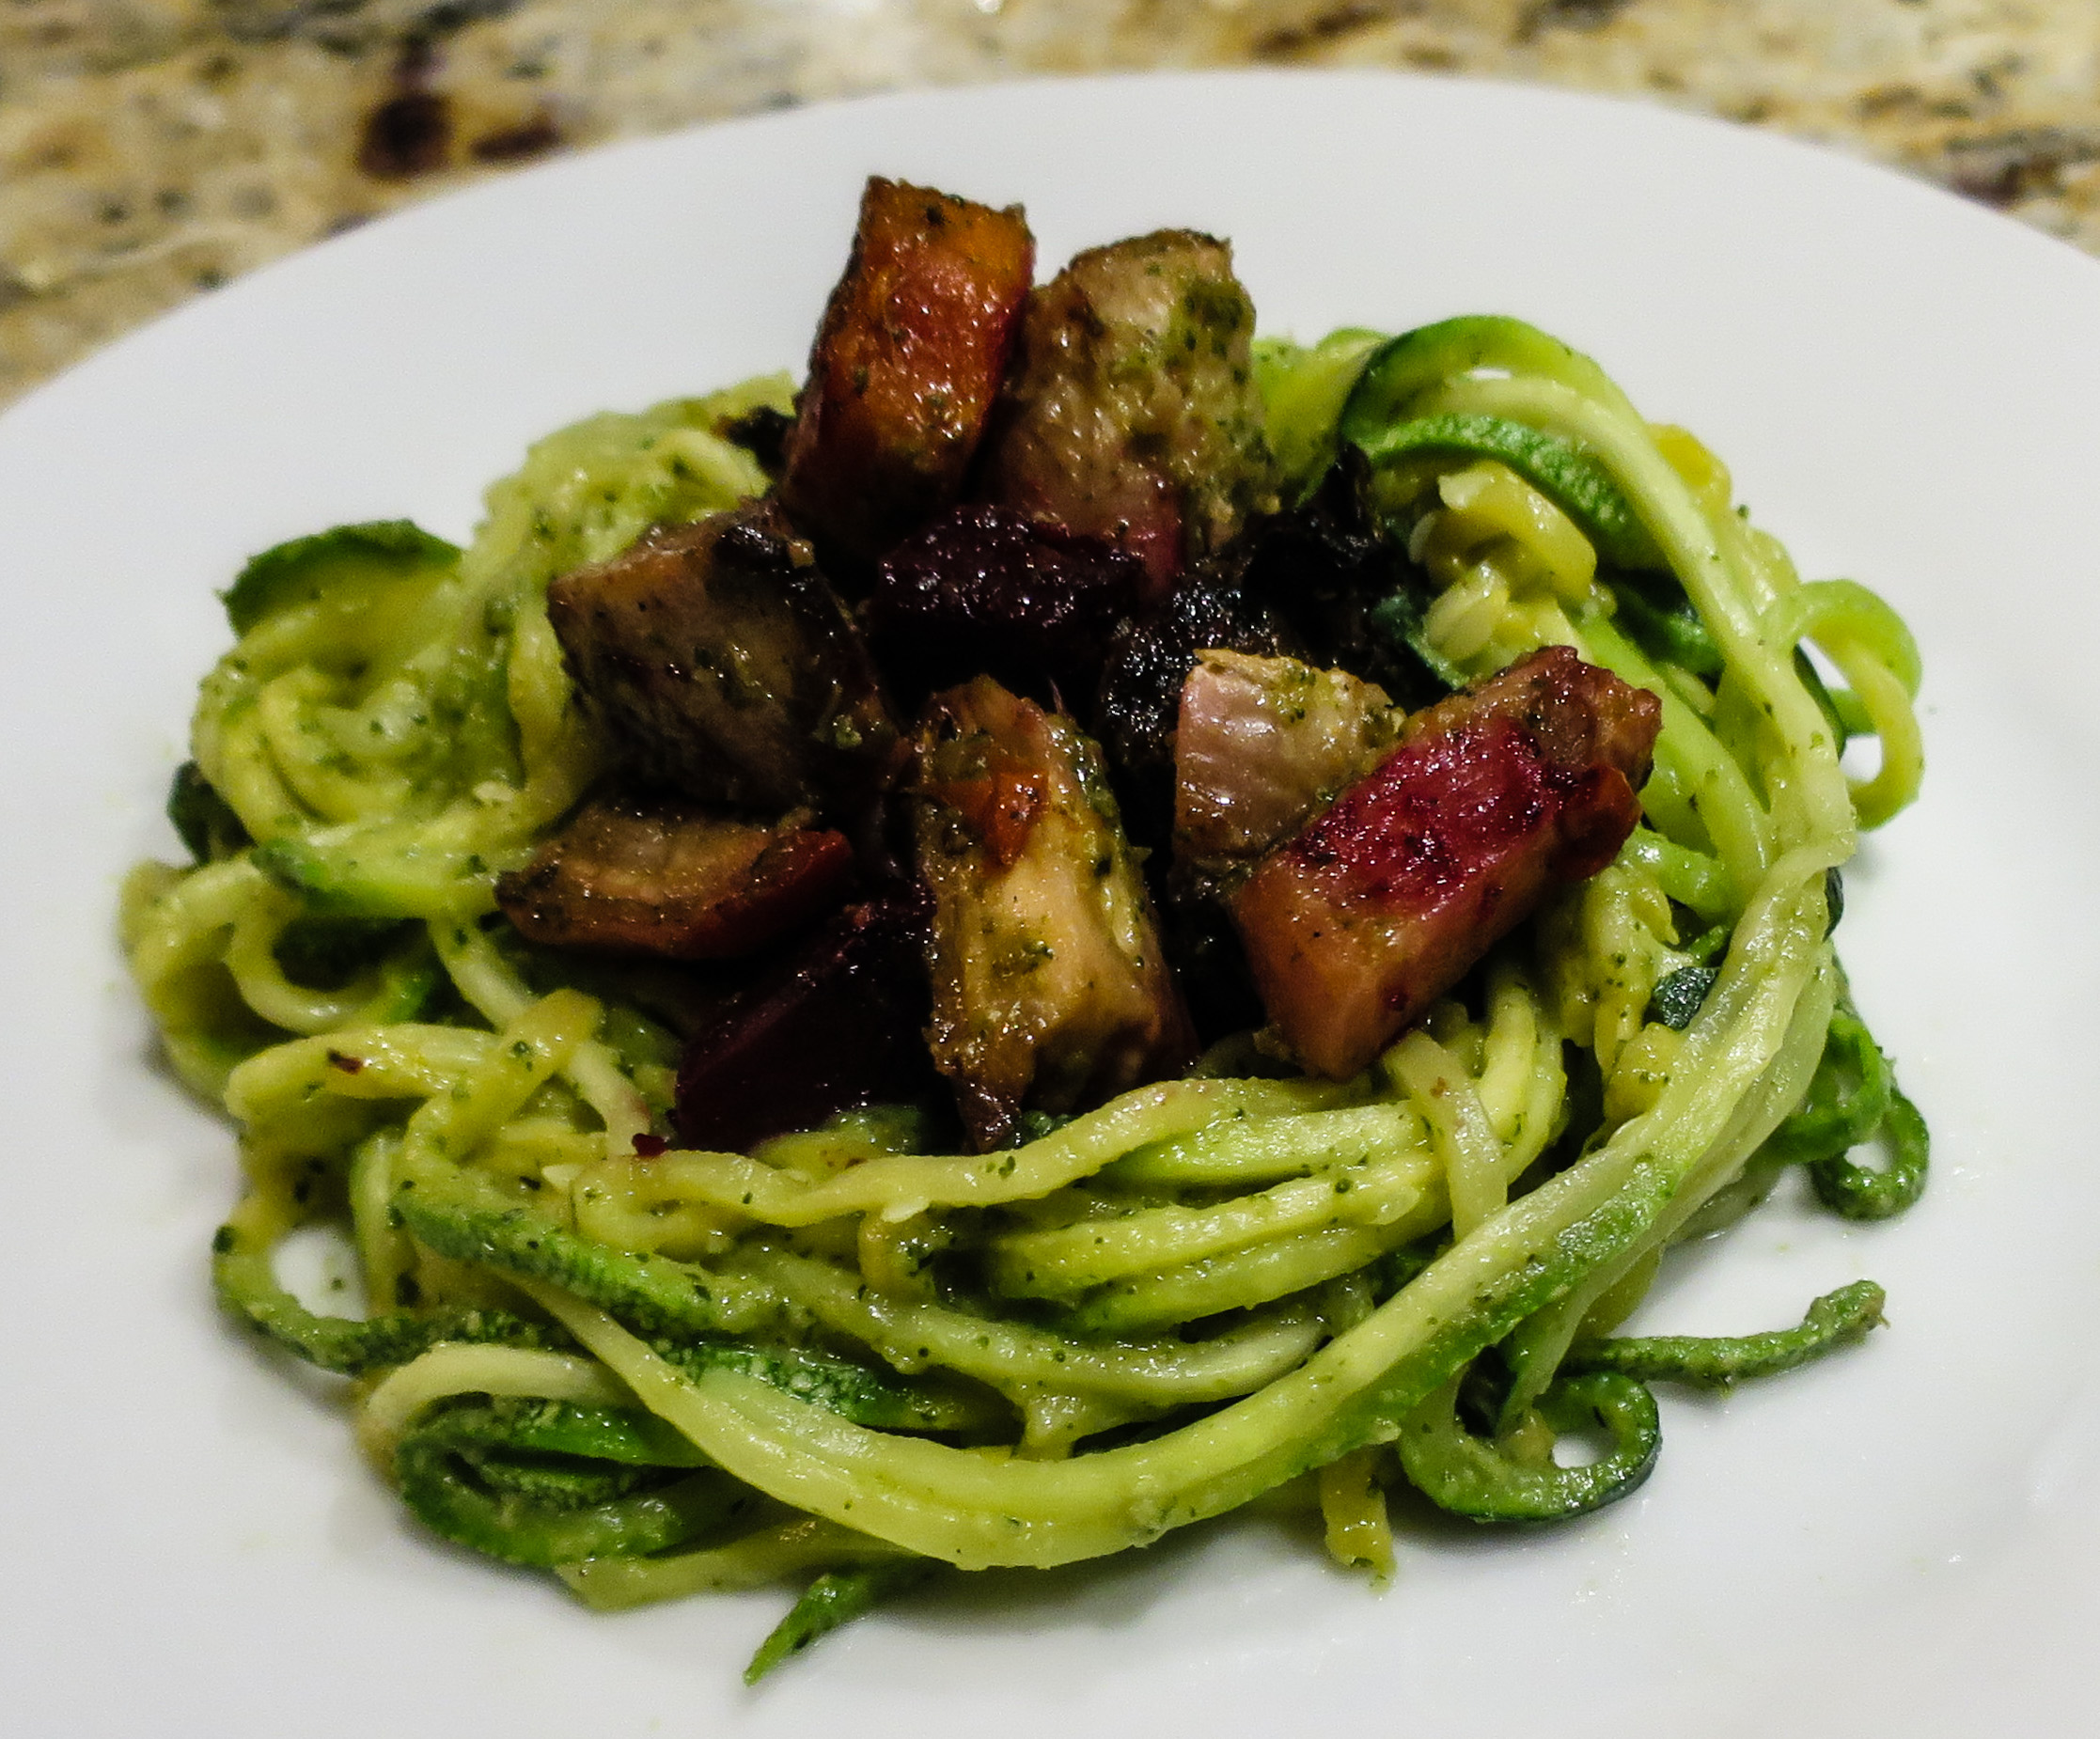 Recipe: Broccoli Pesto Sauce